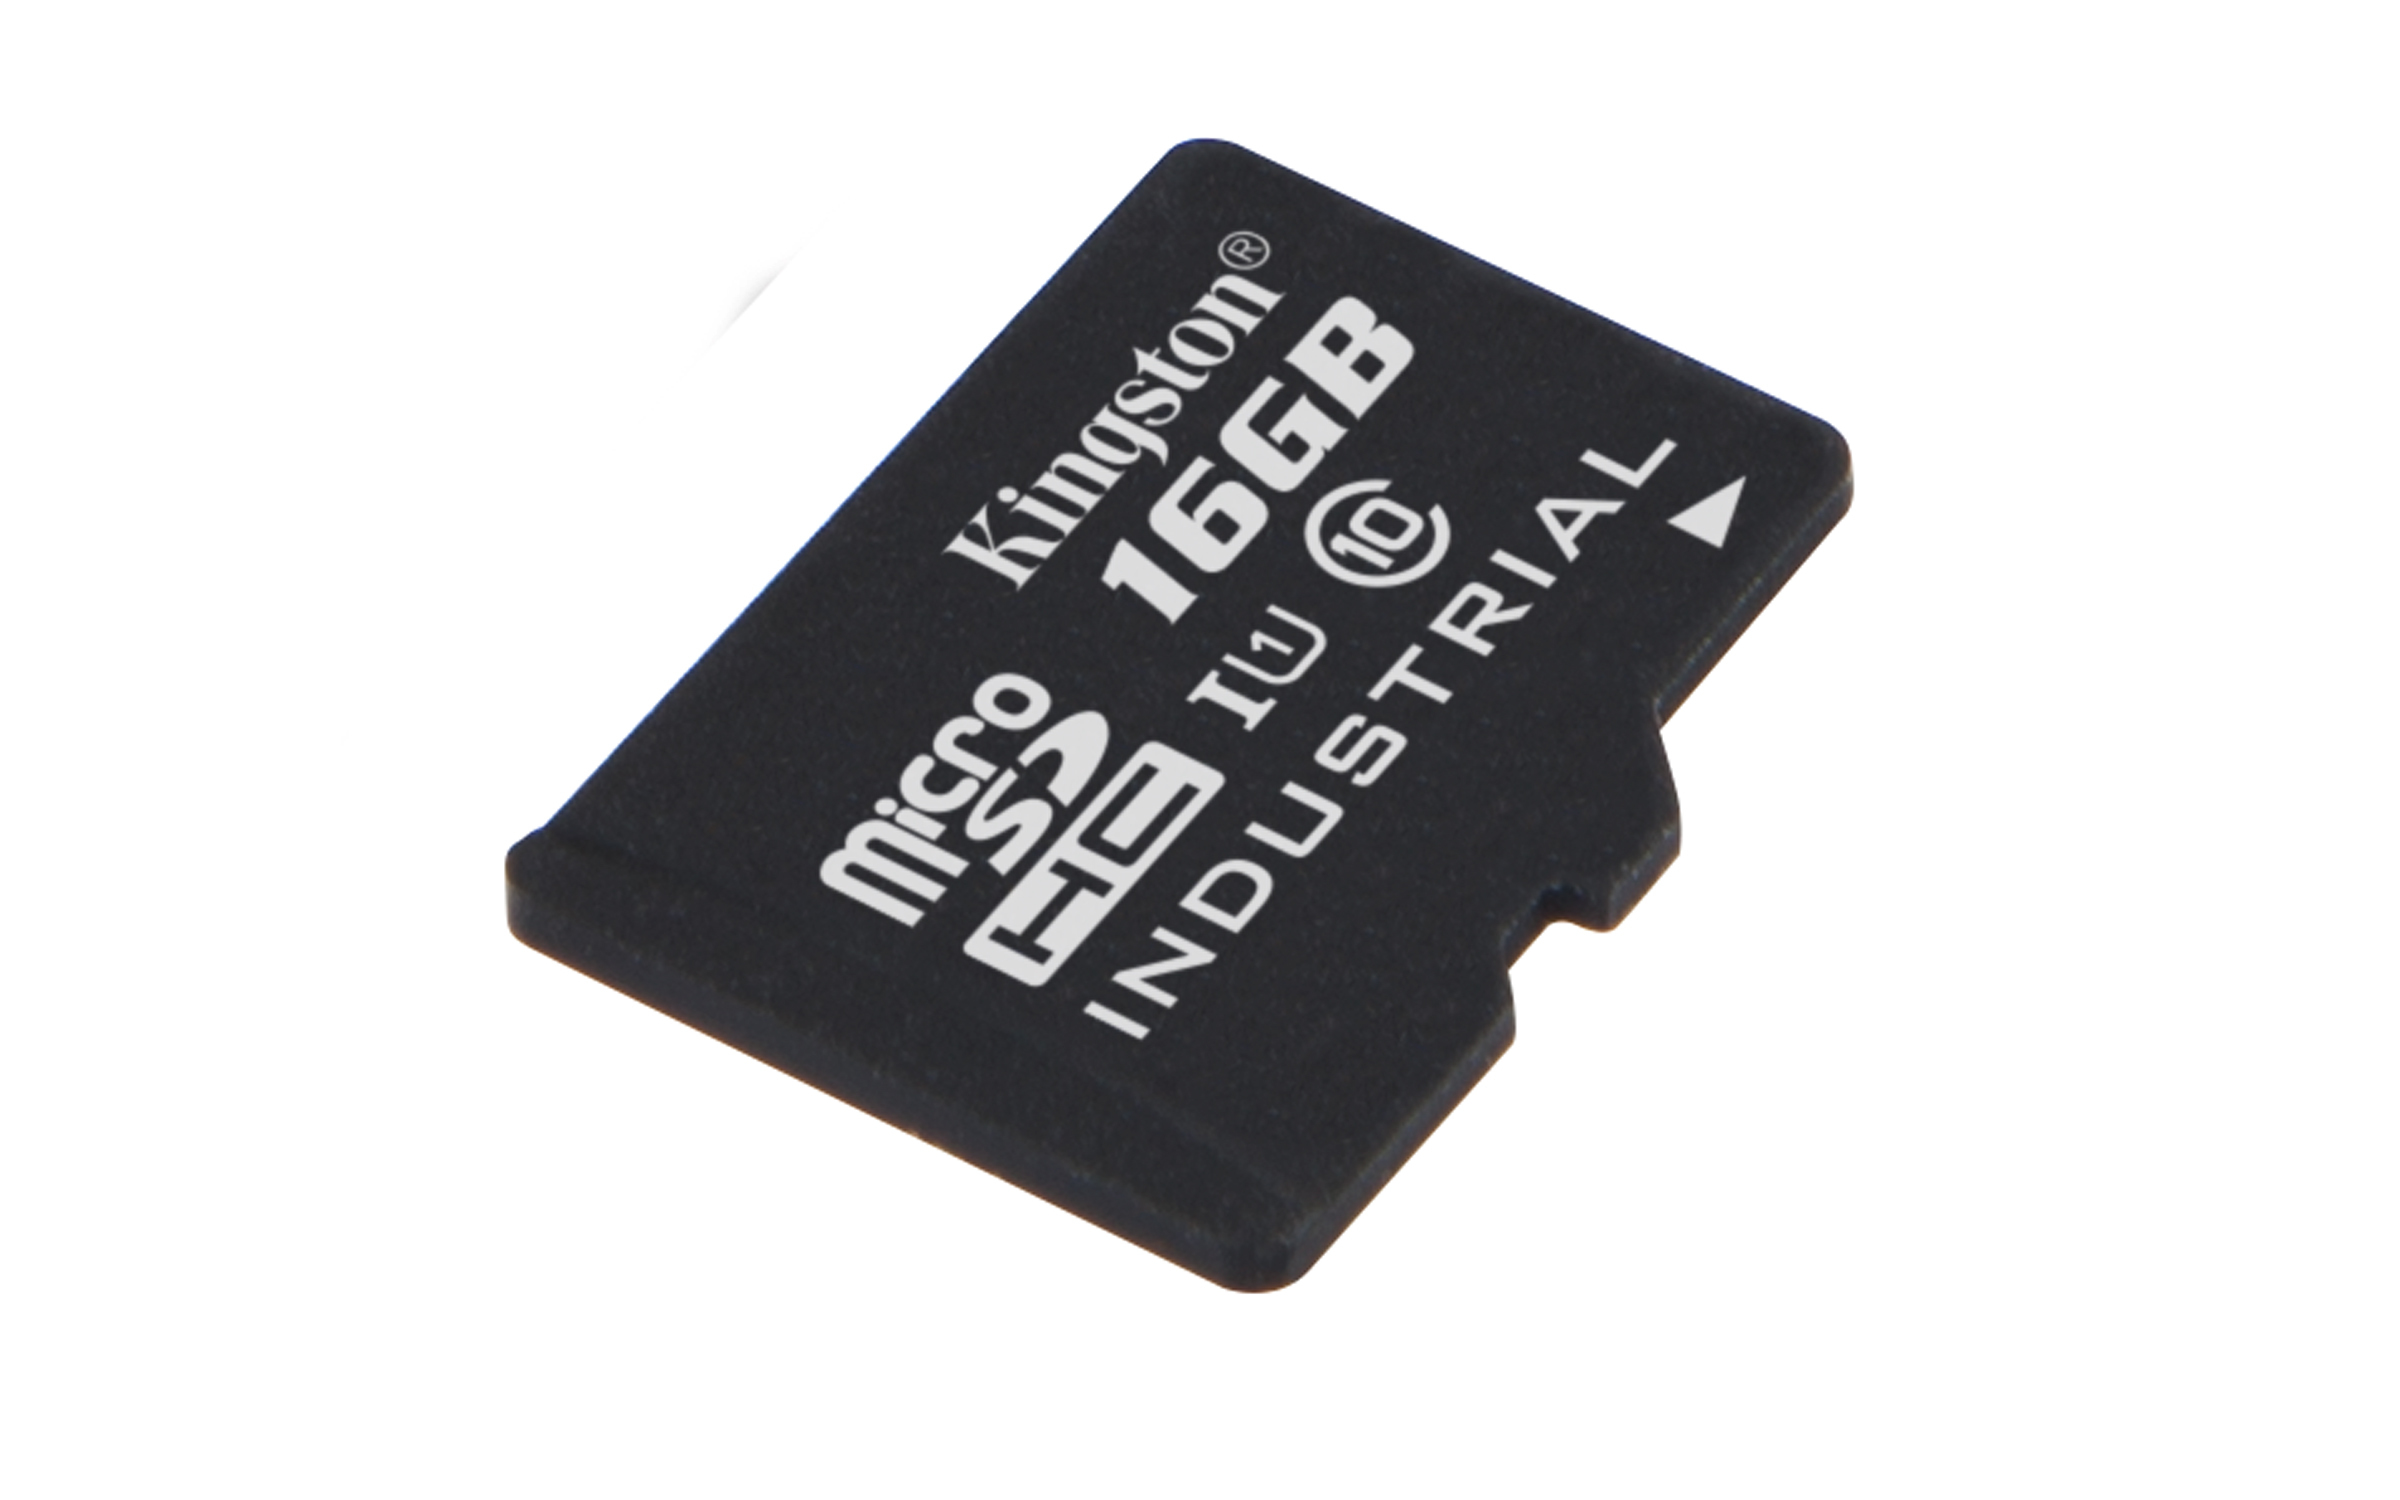 Kingston Technology Industrial Temperature microSD UHS-I 16GB 16GB MicroSDHC UHS-I Class 10 memory card